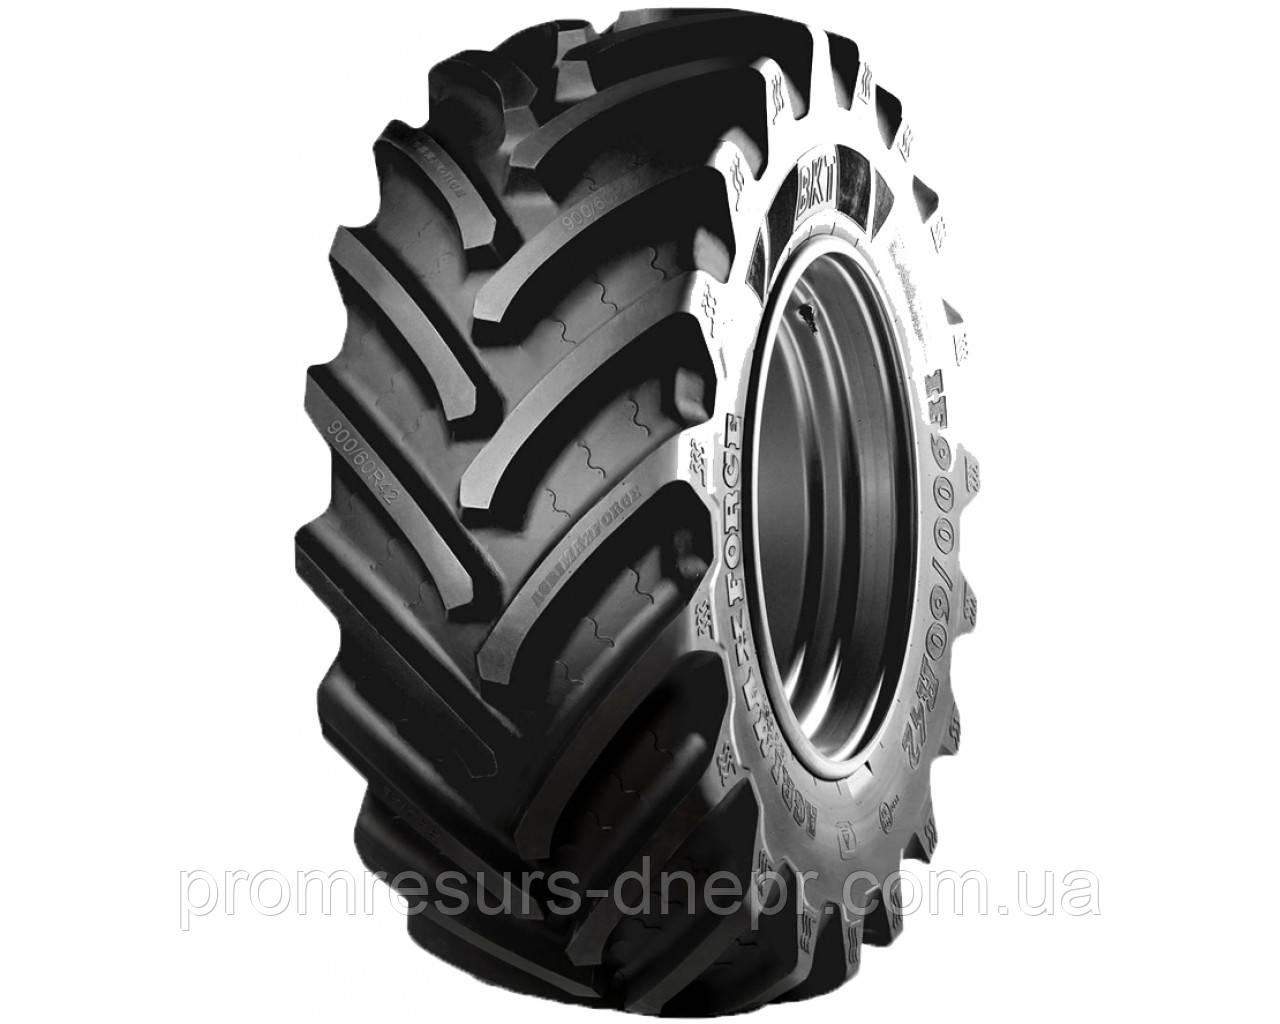 Шина пневматическая тракторная 650/65 R42 168A8/165D BKT AGRIMAX RT-657